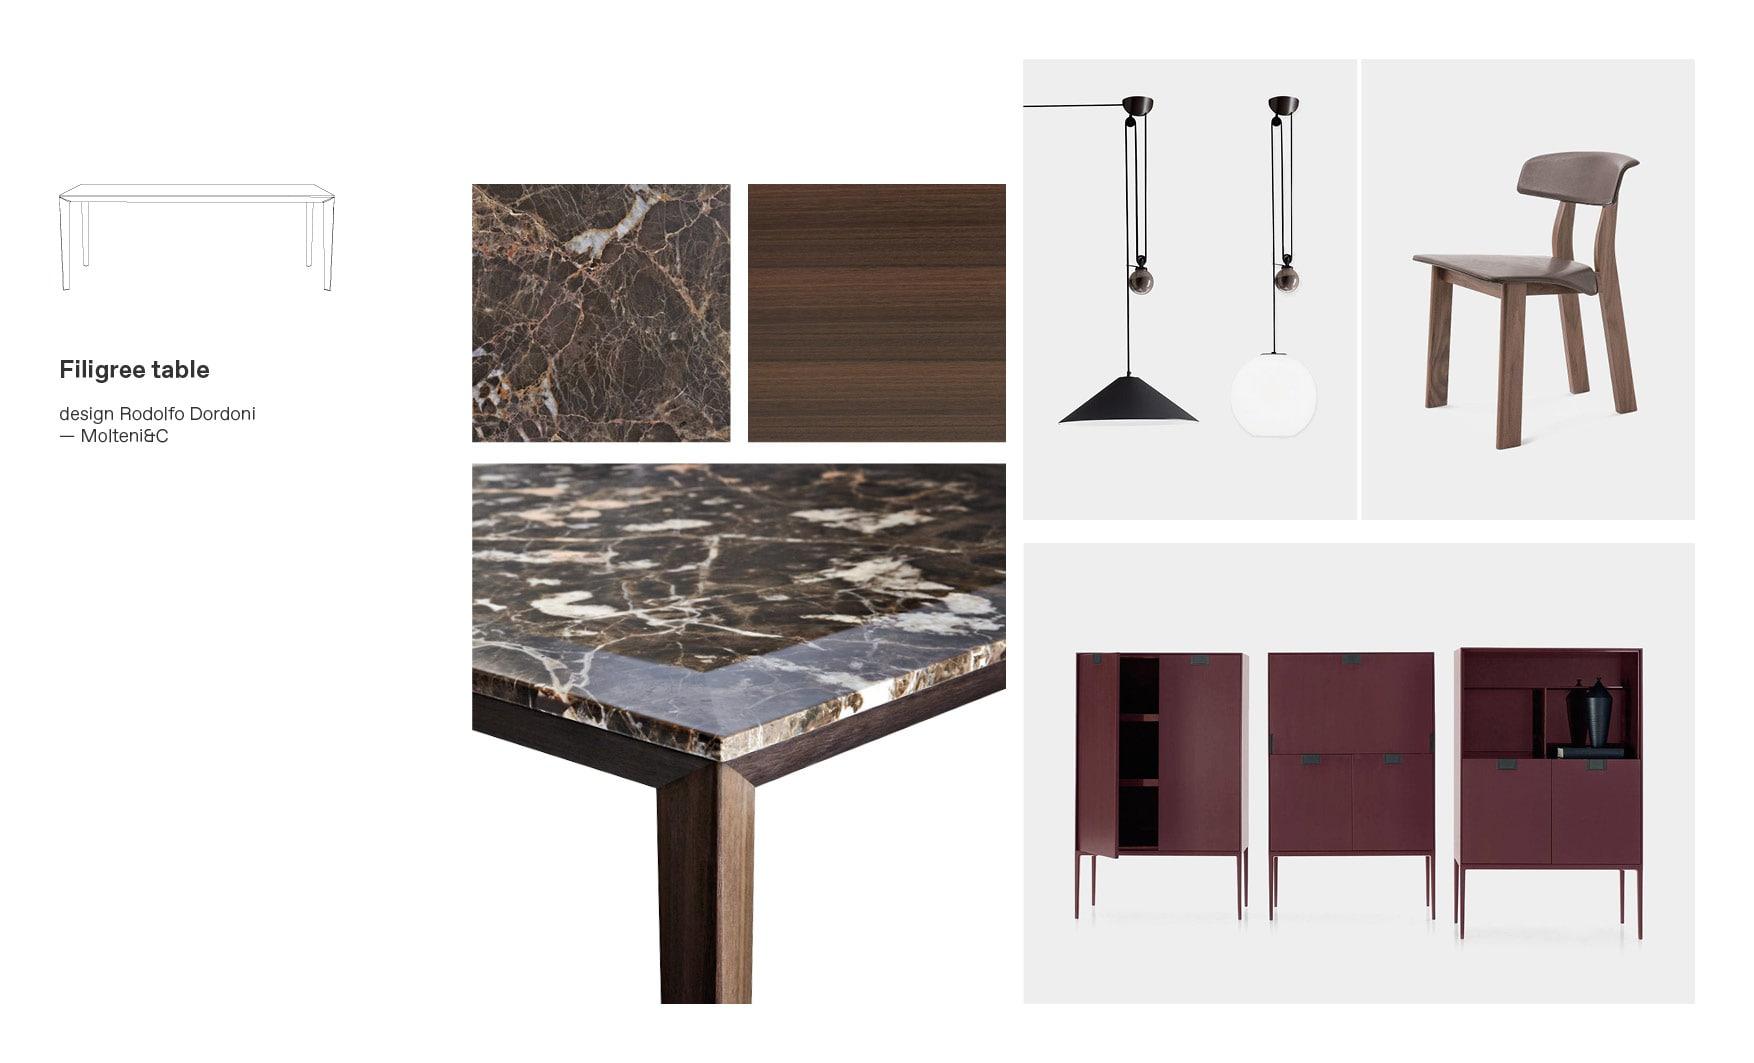 Molteni dining tables and Filigree moodboard composition by Esperiri